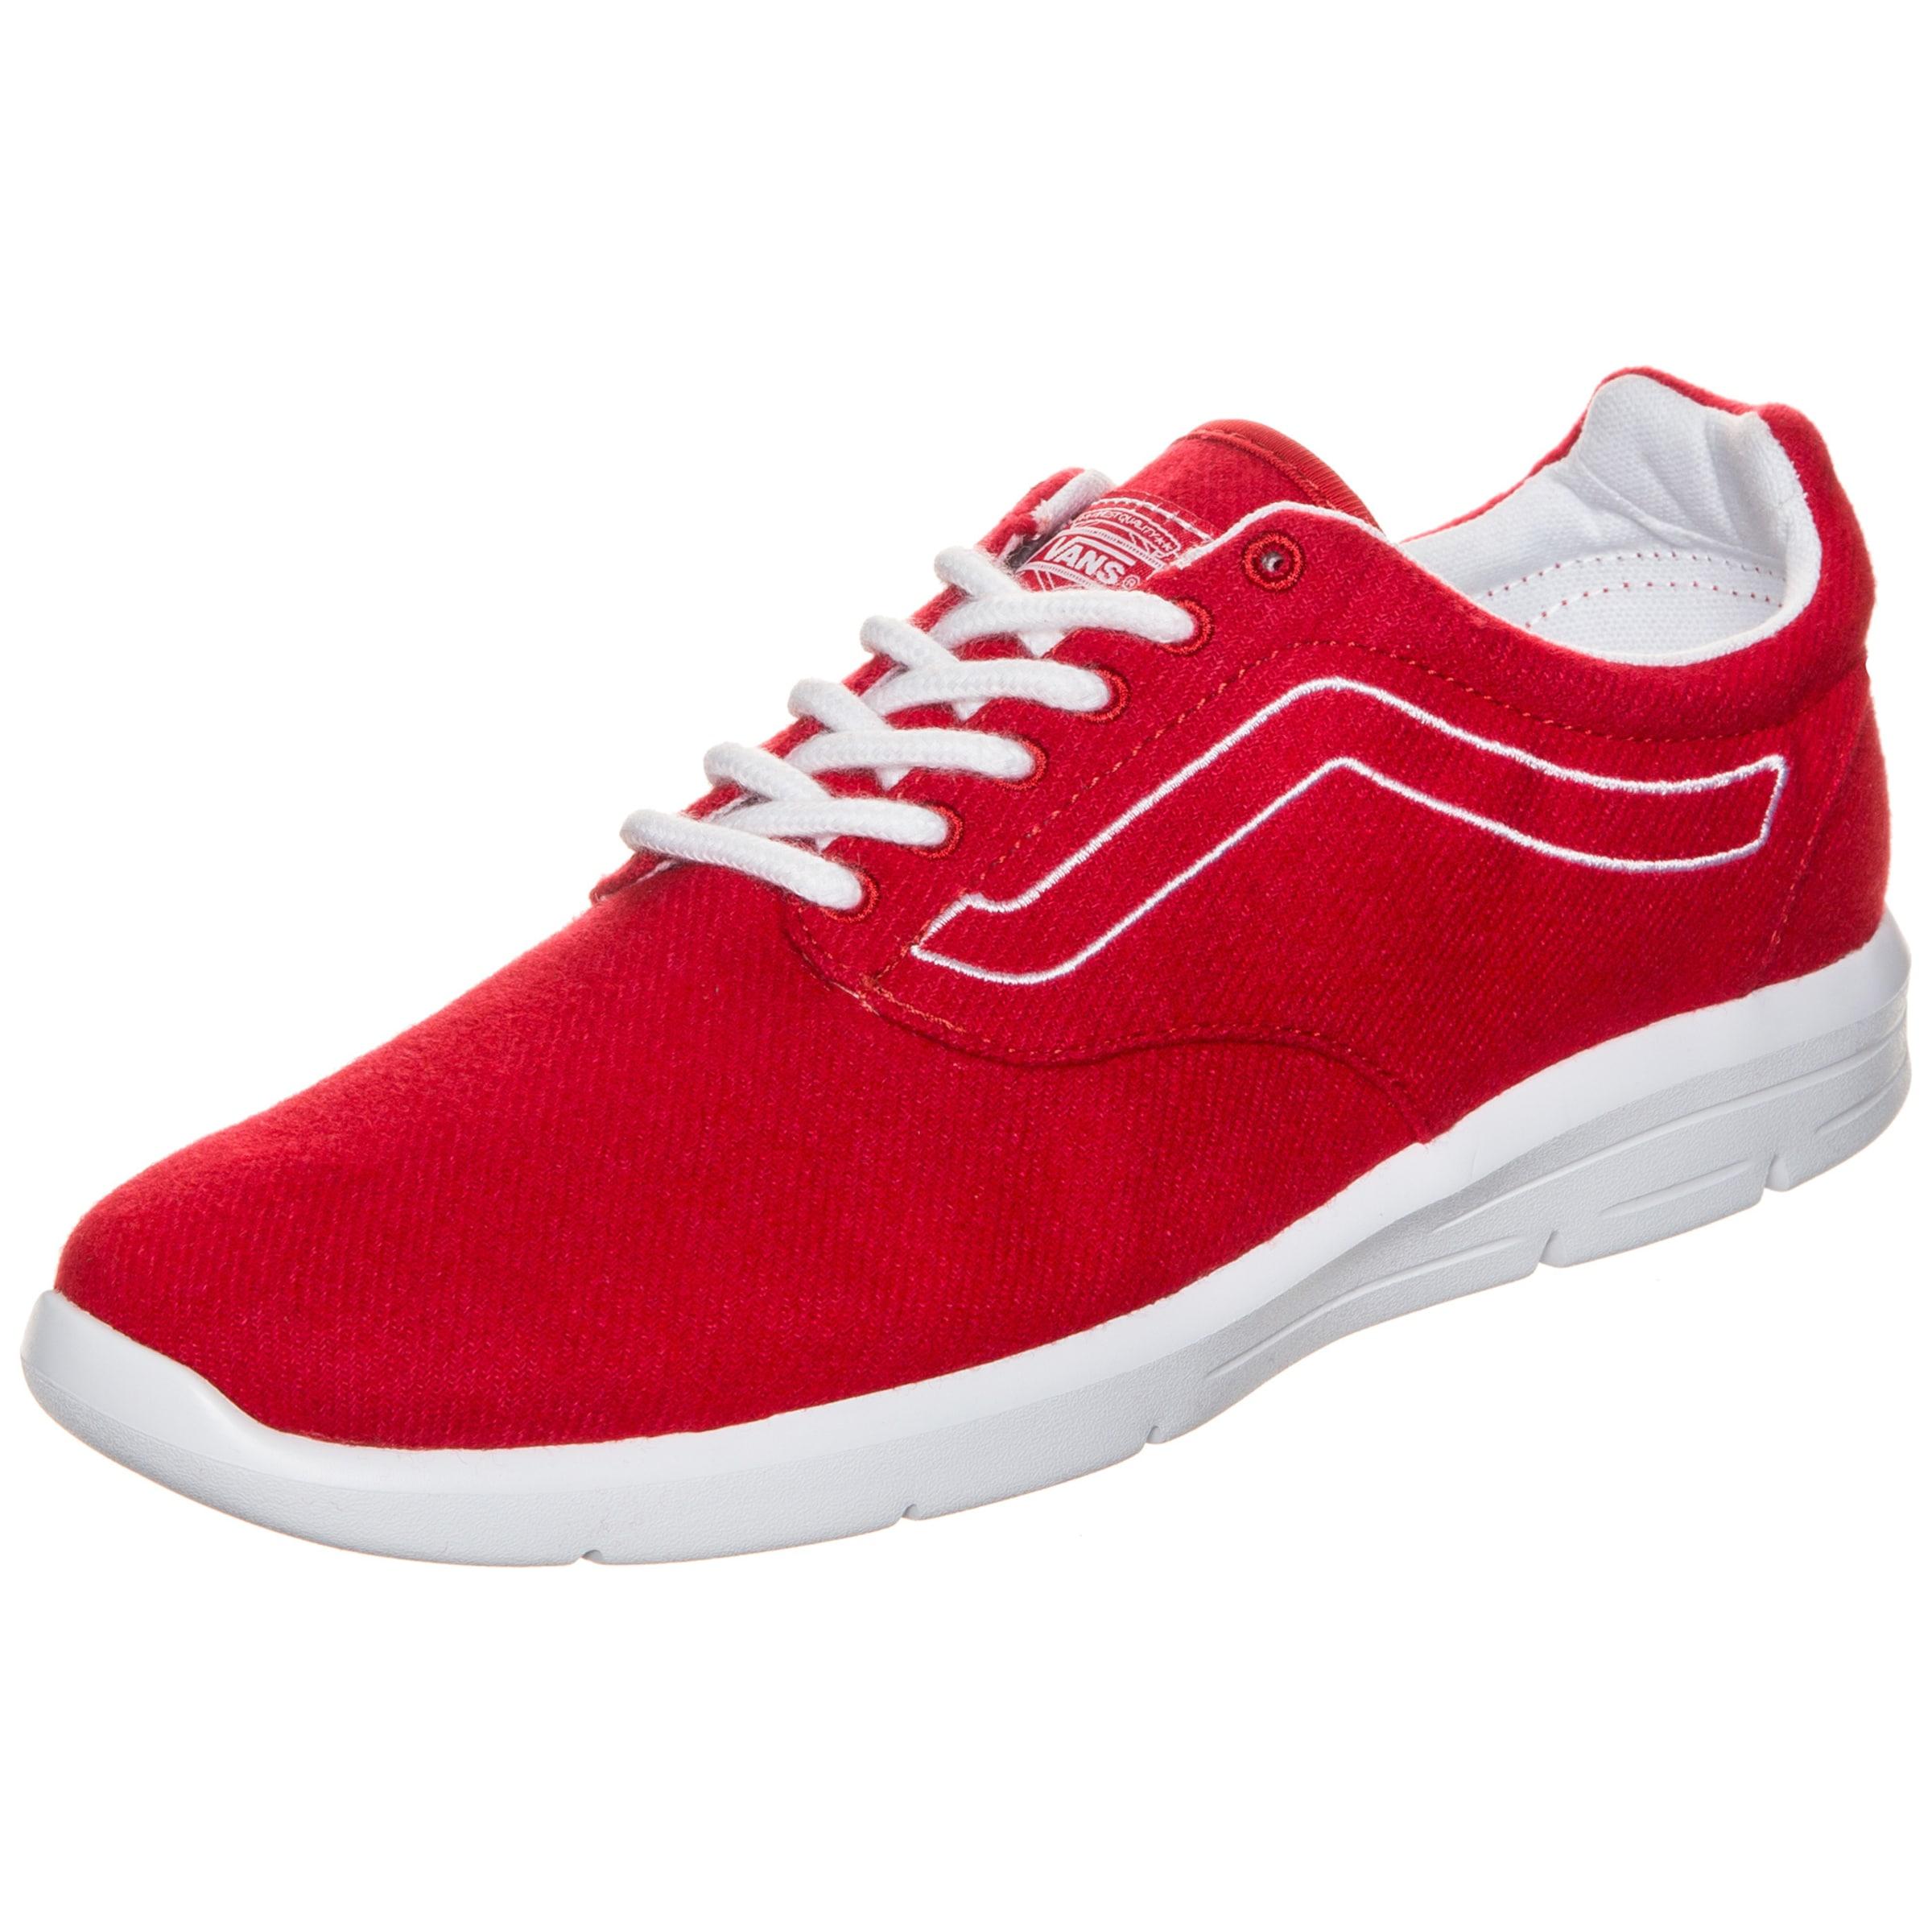 VANS   Iso 1.5 Varsity Sneaker Sneaker Sneaker 244b13